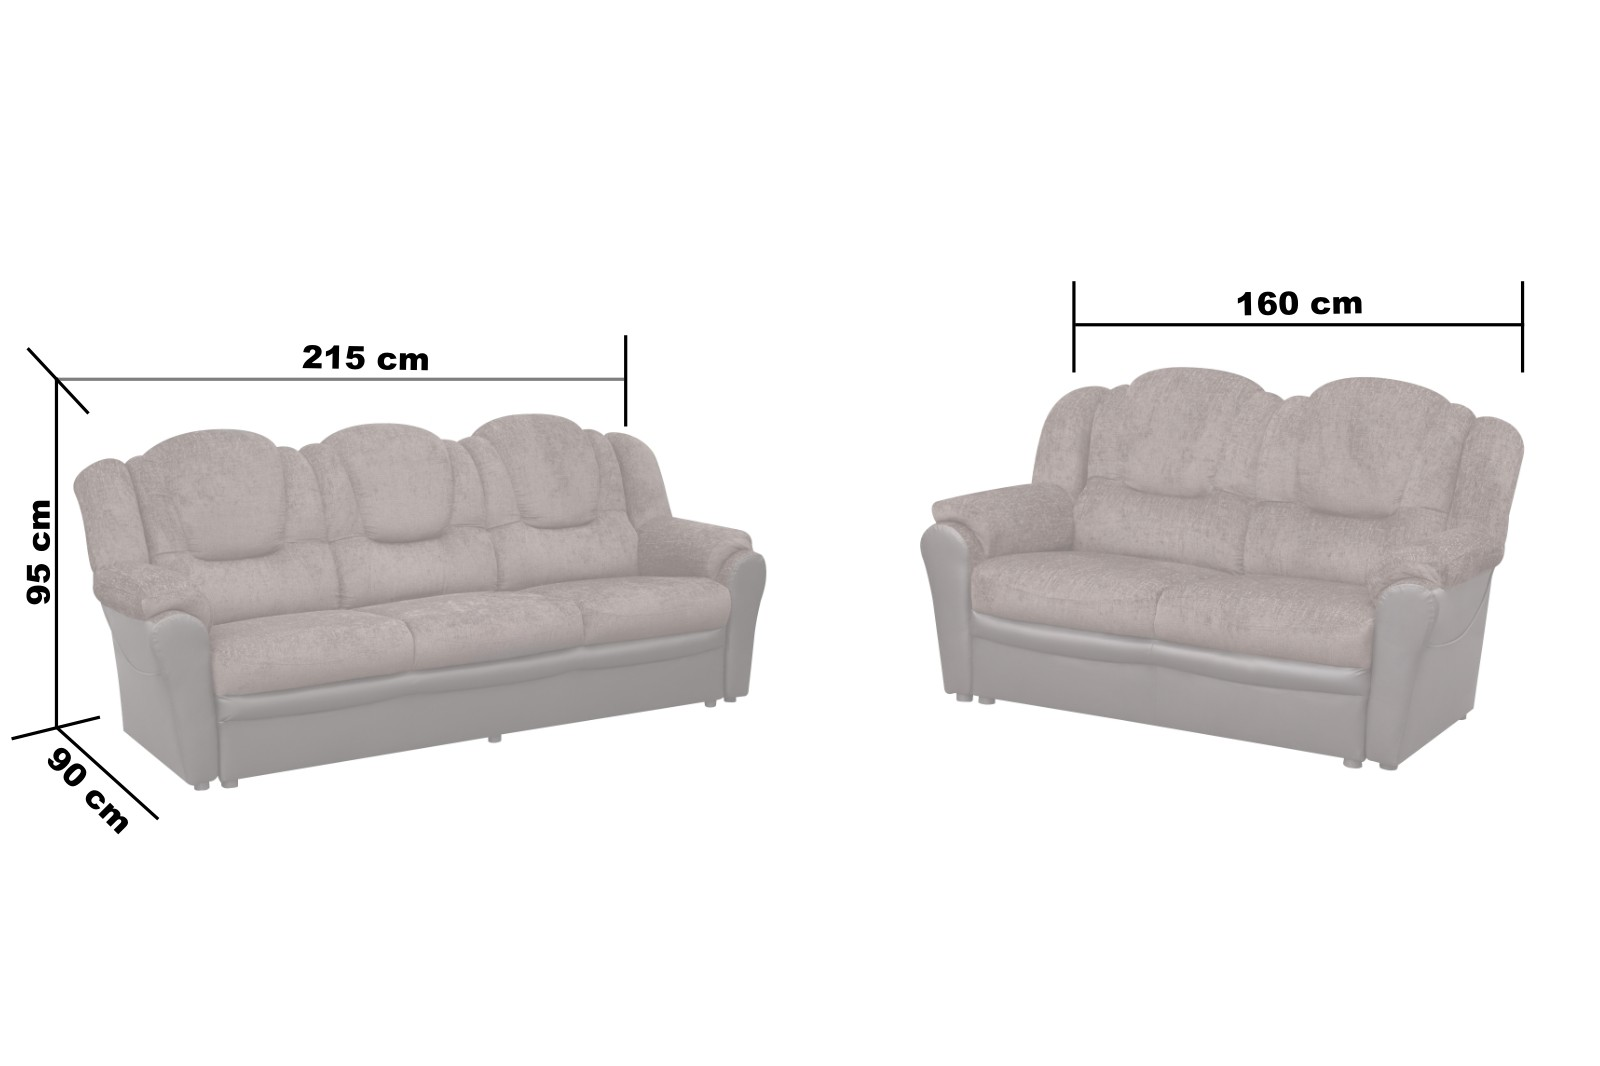 Arizona Fabric 3+2 Seater Sofa Black and Grey